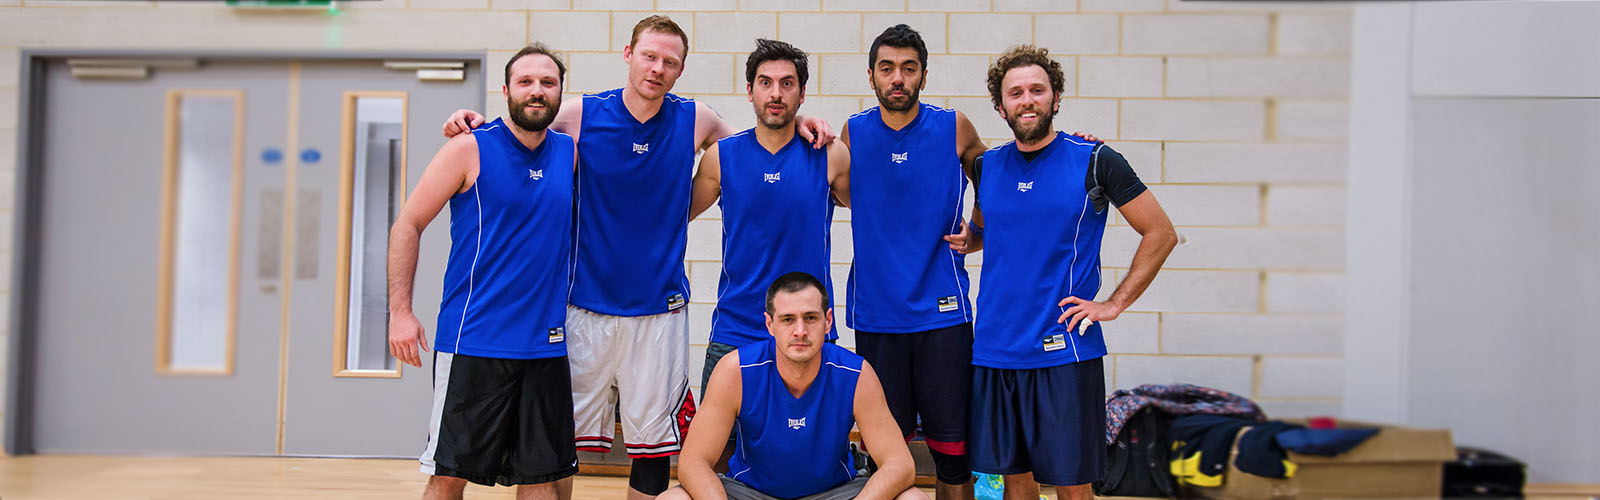 _0034_GOMammoth-Basketball-London